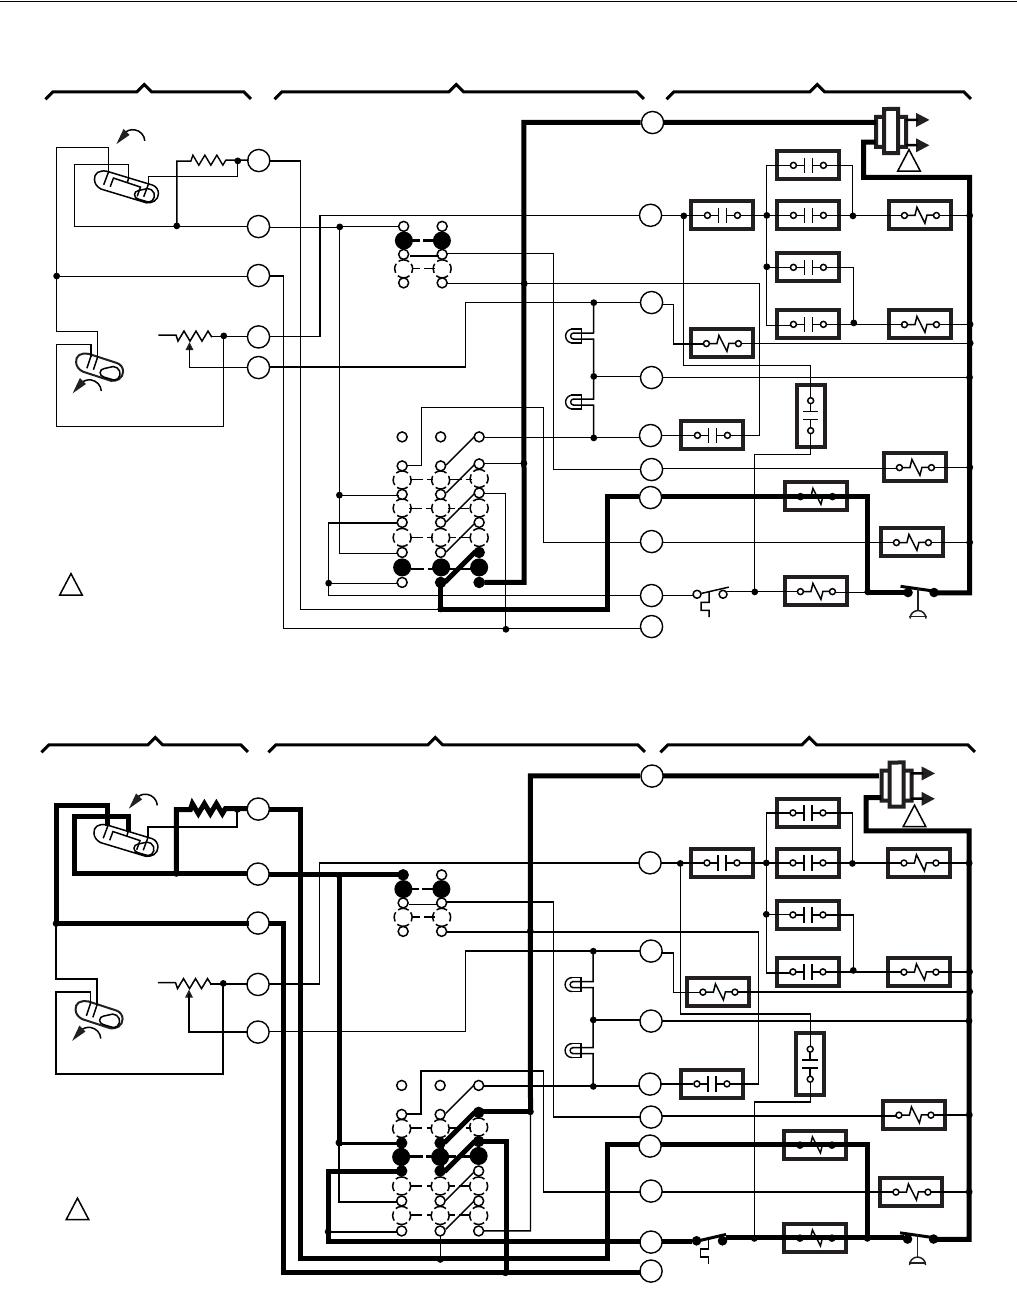 Simple Comfort 2200 Thermostat Wiring Diagram Non-fused